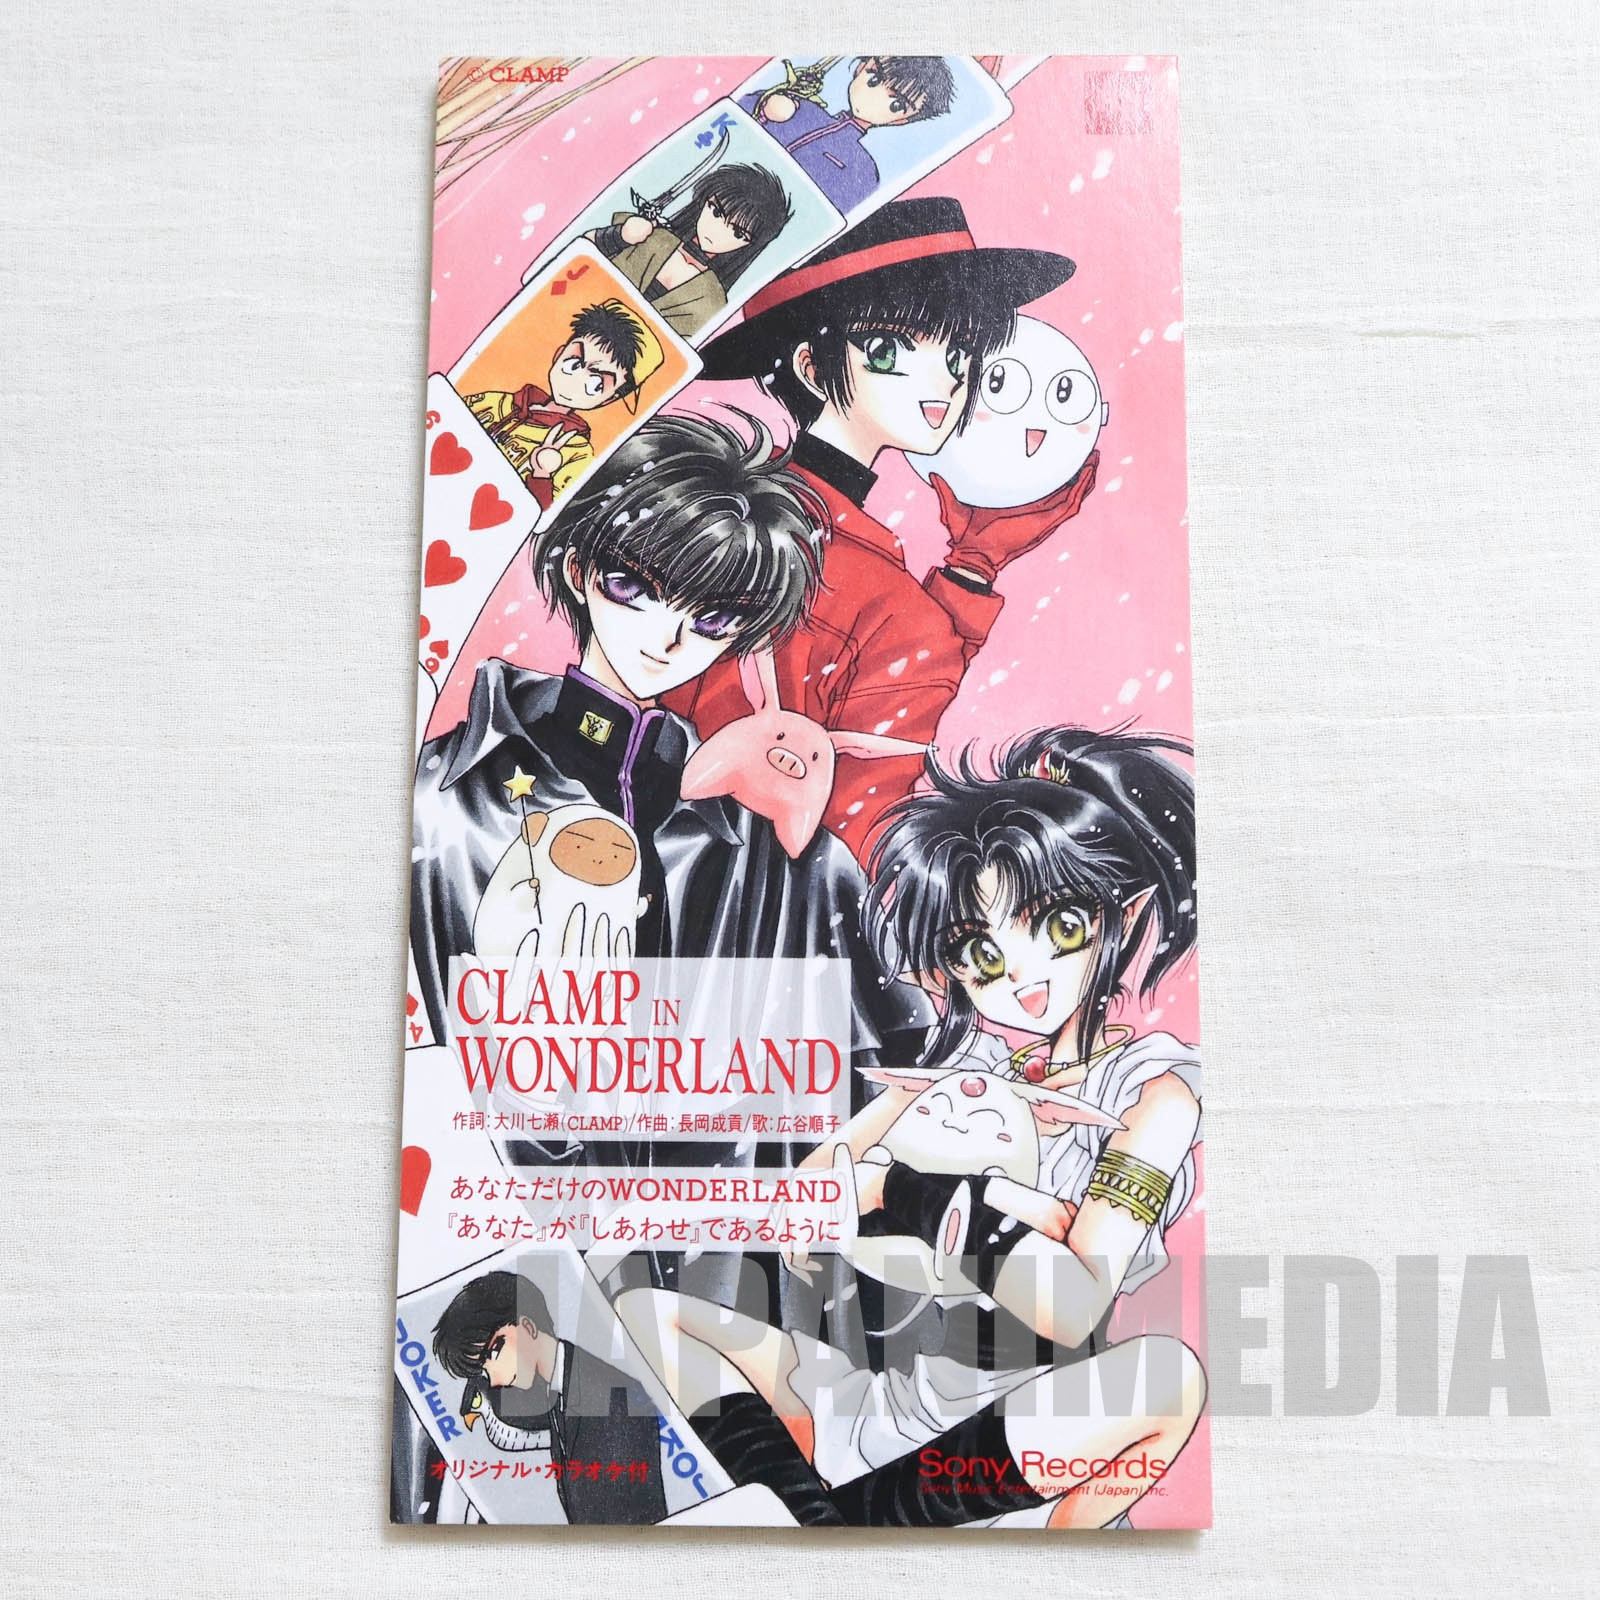 CLAMP IN WONDERLAND Theme song  3 Inch (8cm) Single JAPAN CD